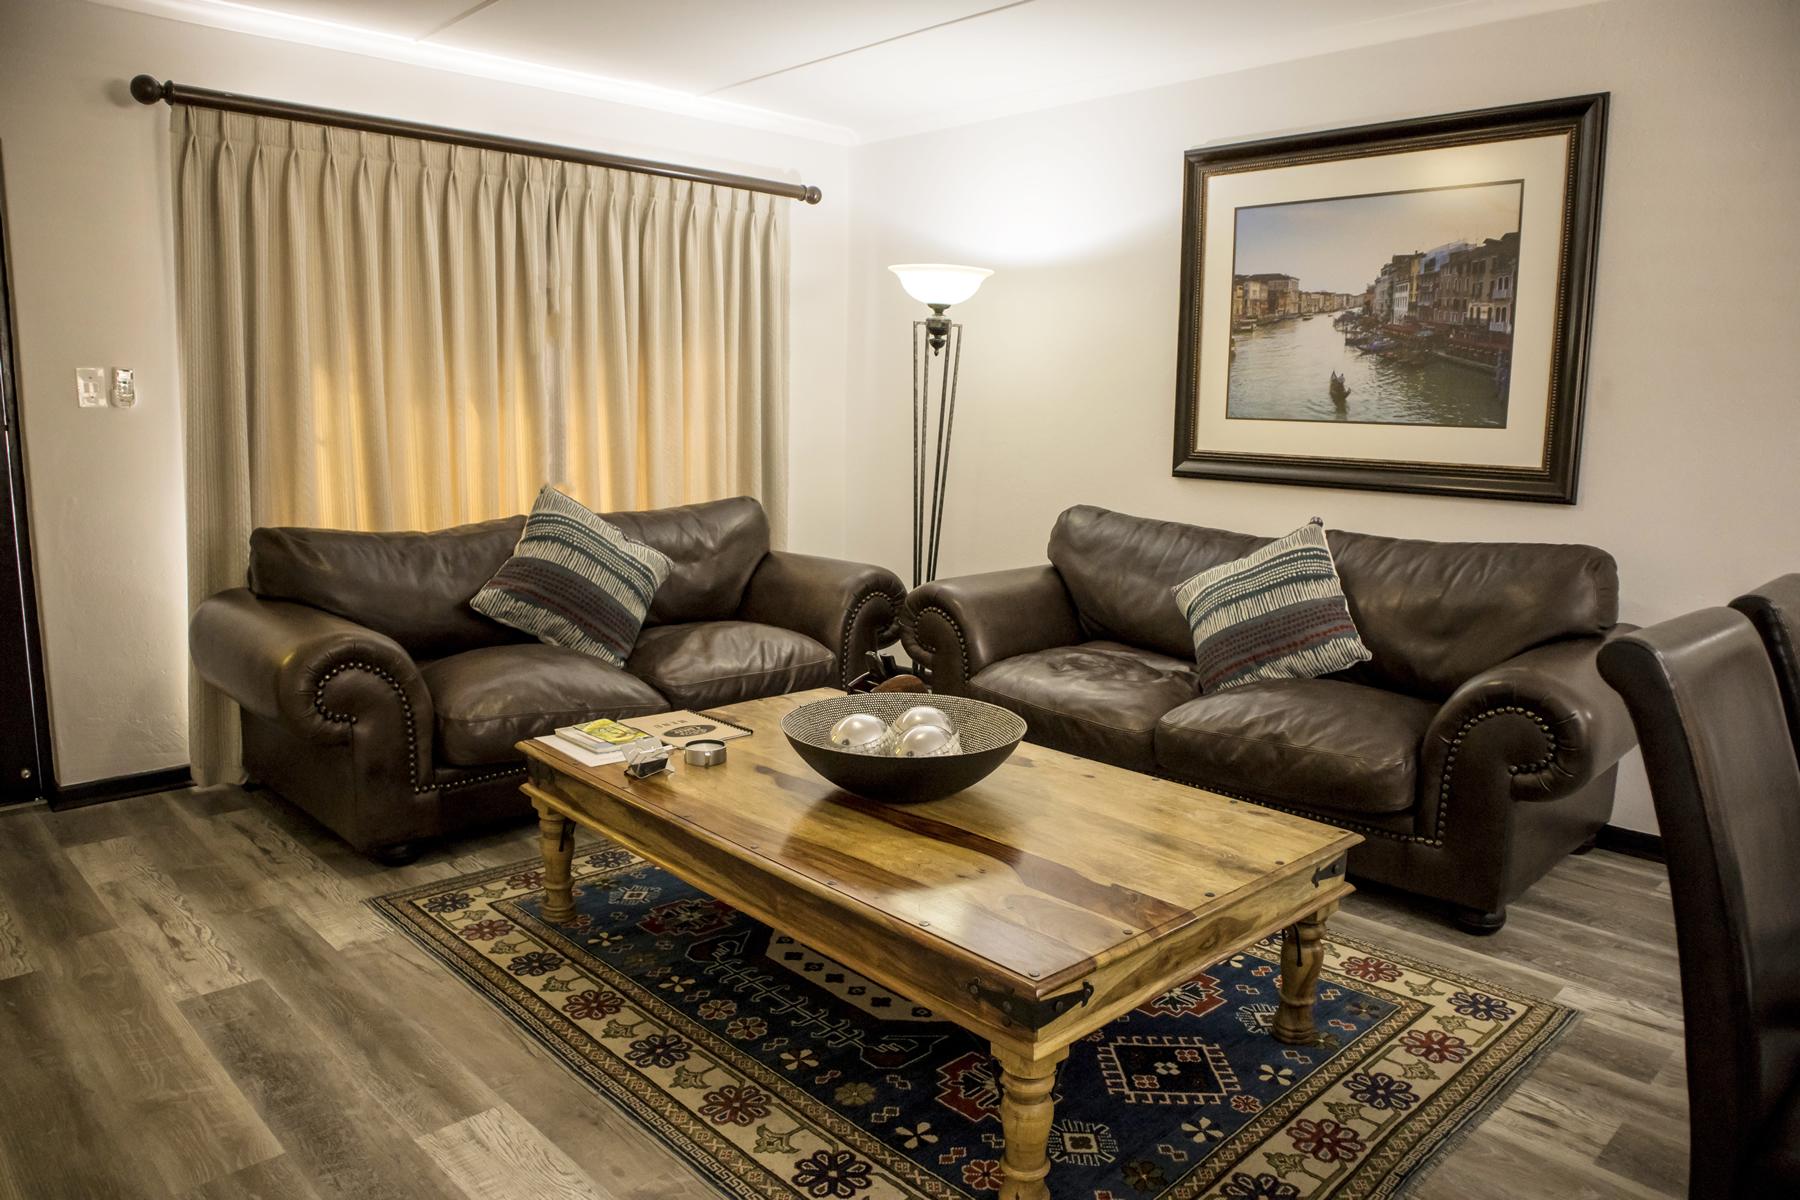 luxury and comfort